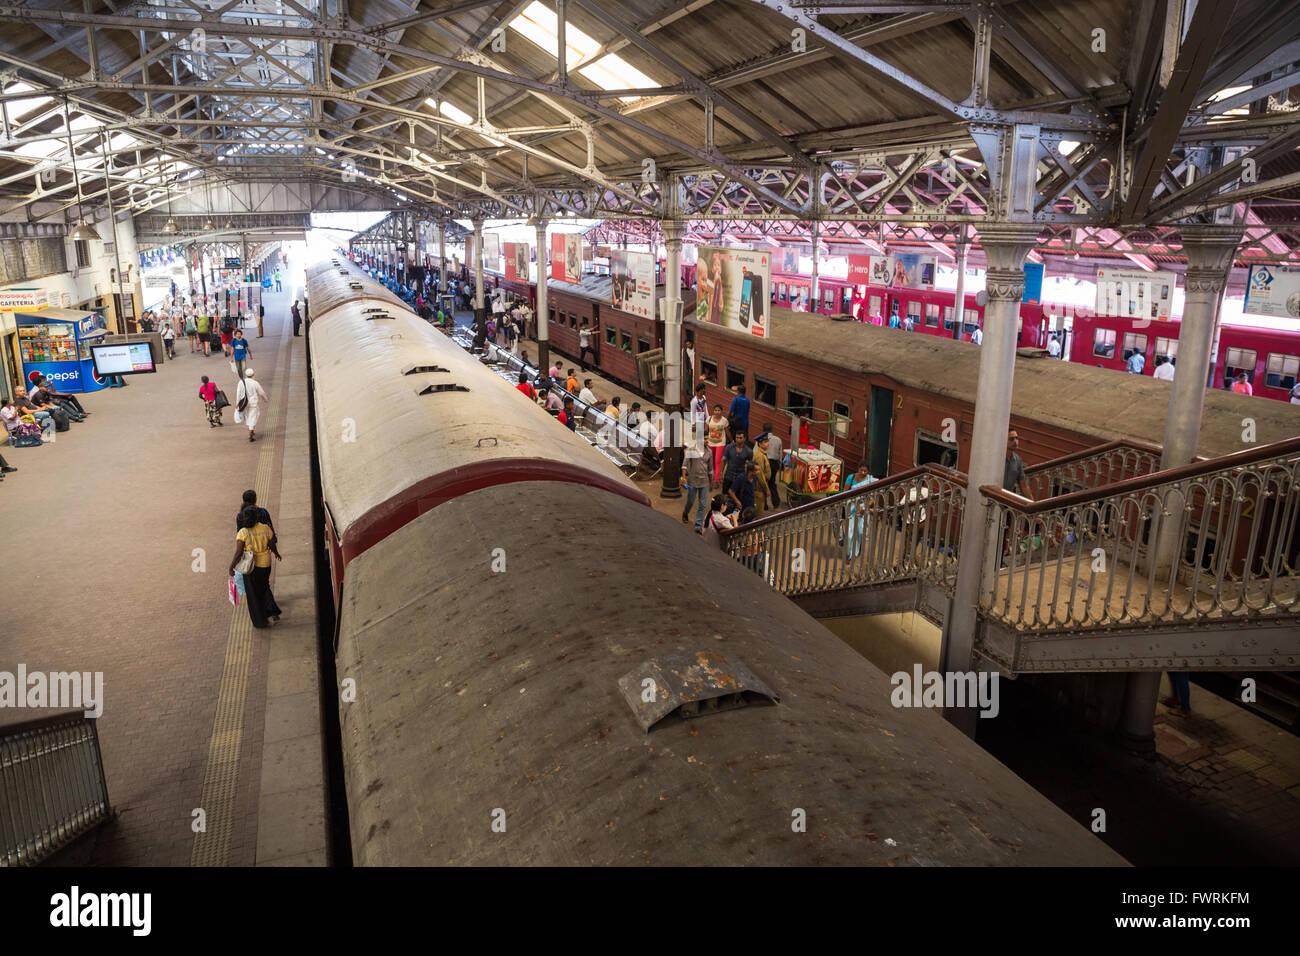 Train platform people inside Fort railway station, Colombo, Sri Lanka, Asia - Stock Image